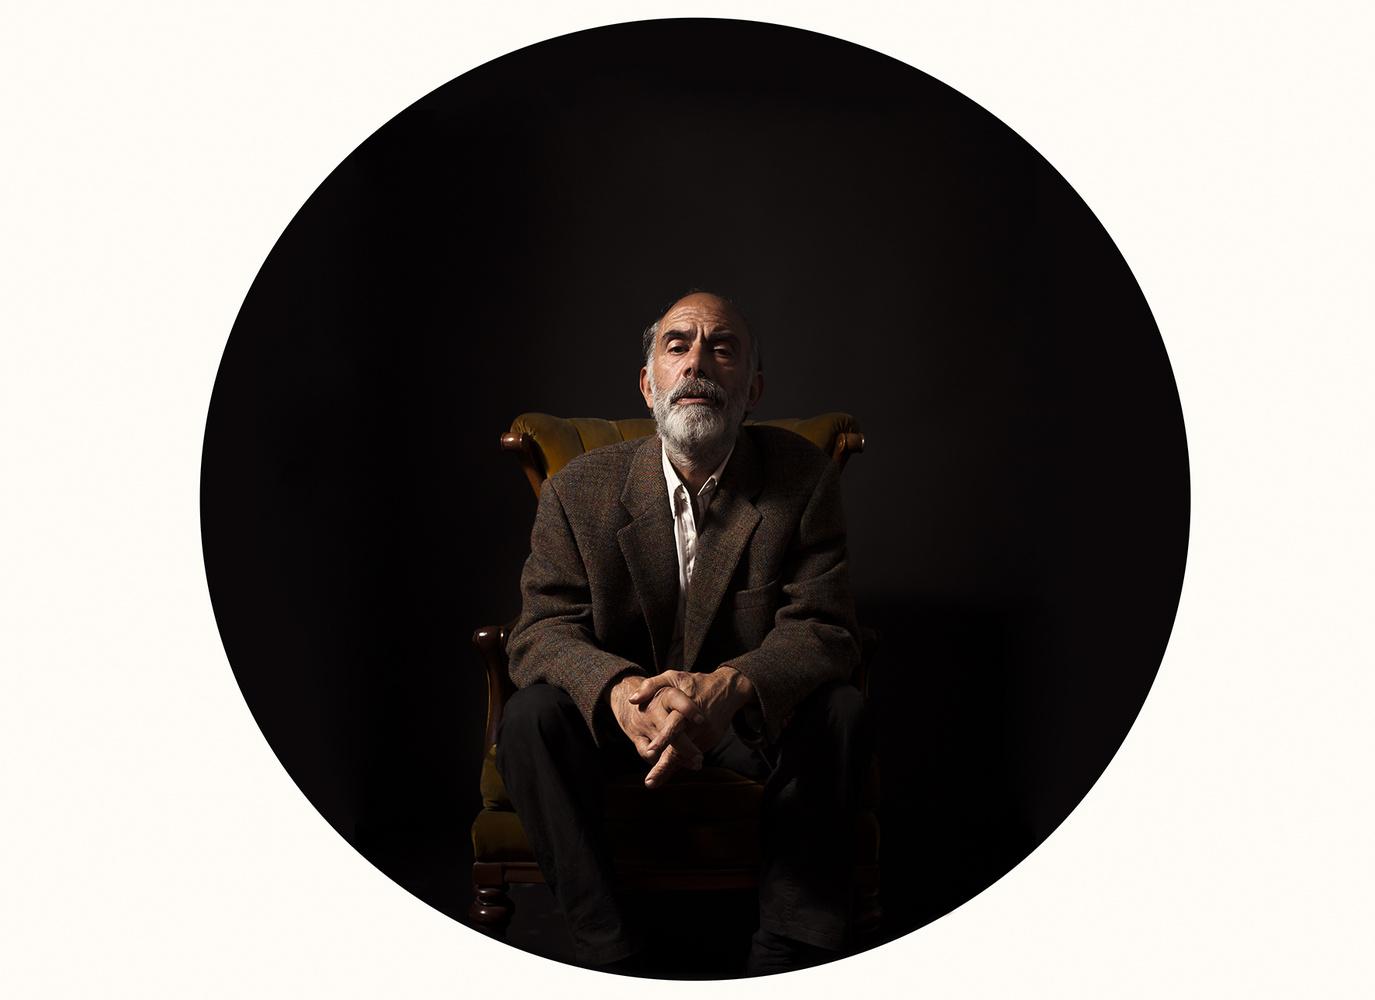 Padre by Ull Galindez